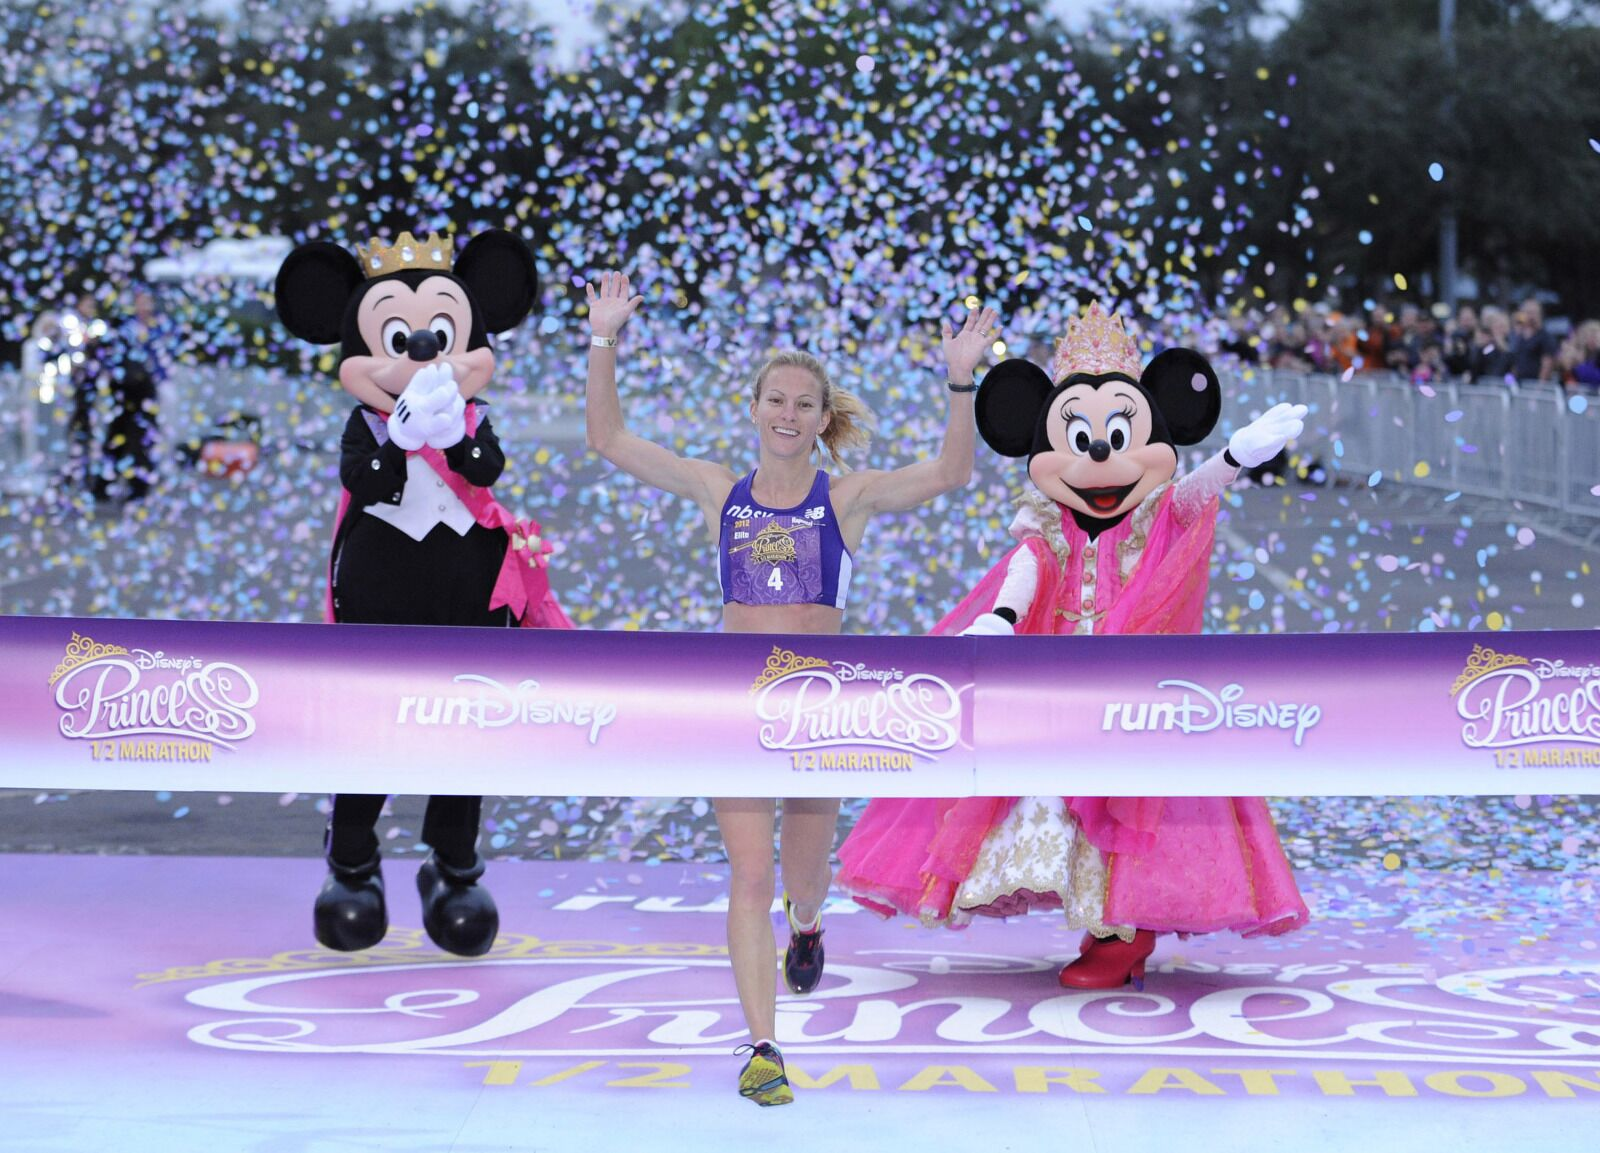 Run the Disney Princess Half Marathon, Enjoy the Sparkly Booze